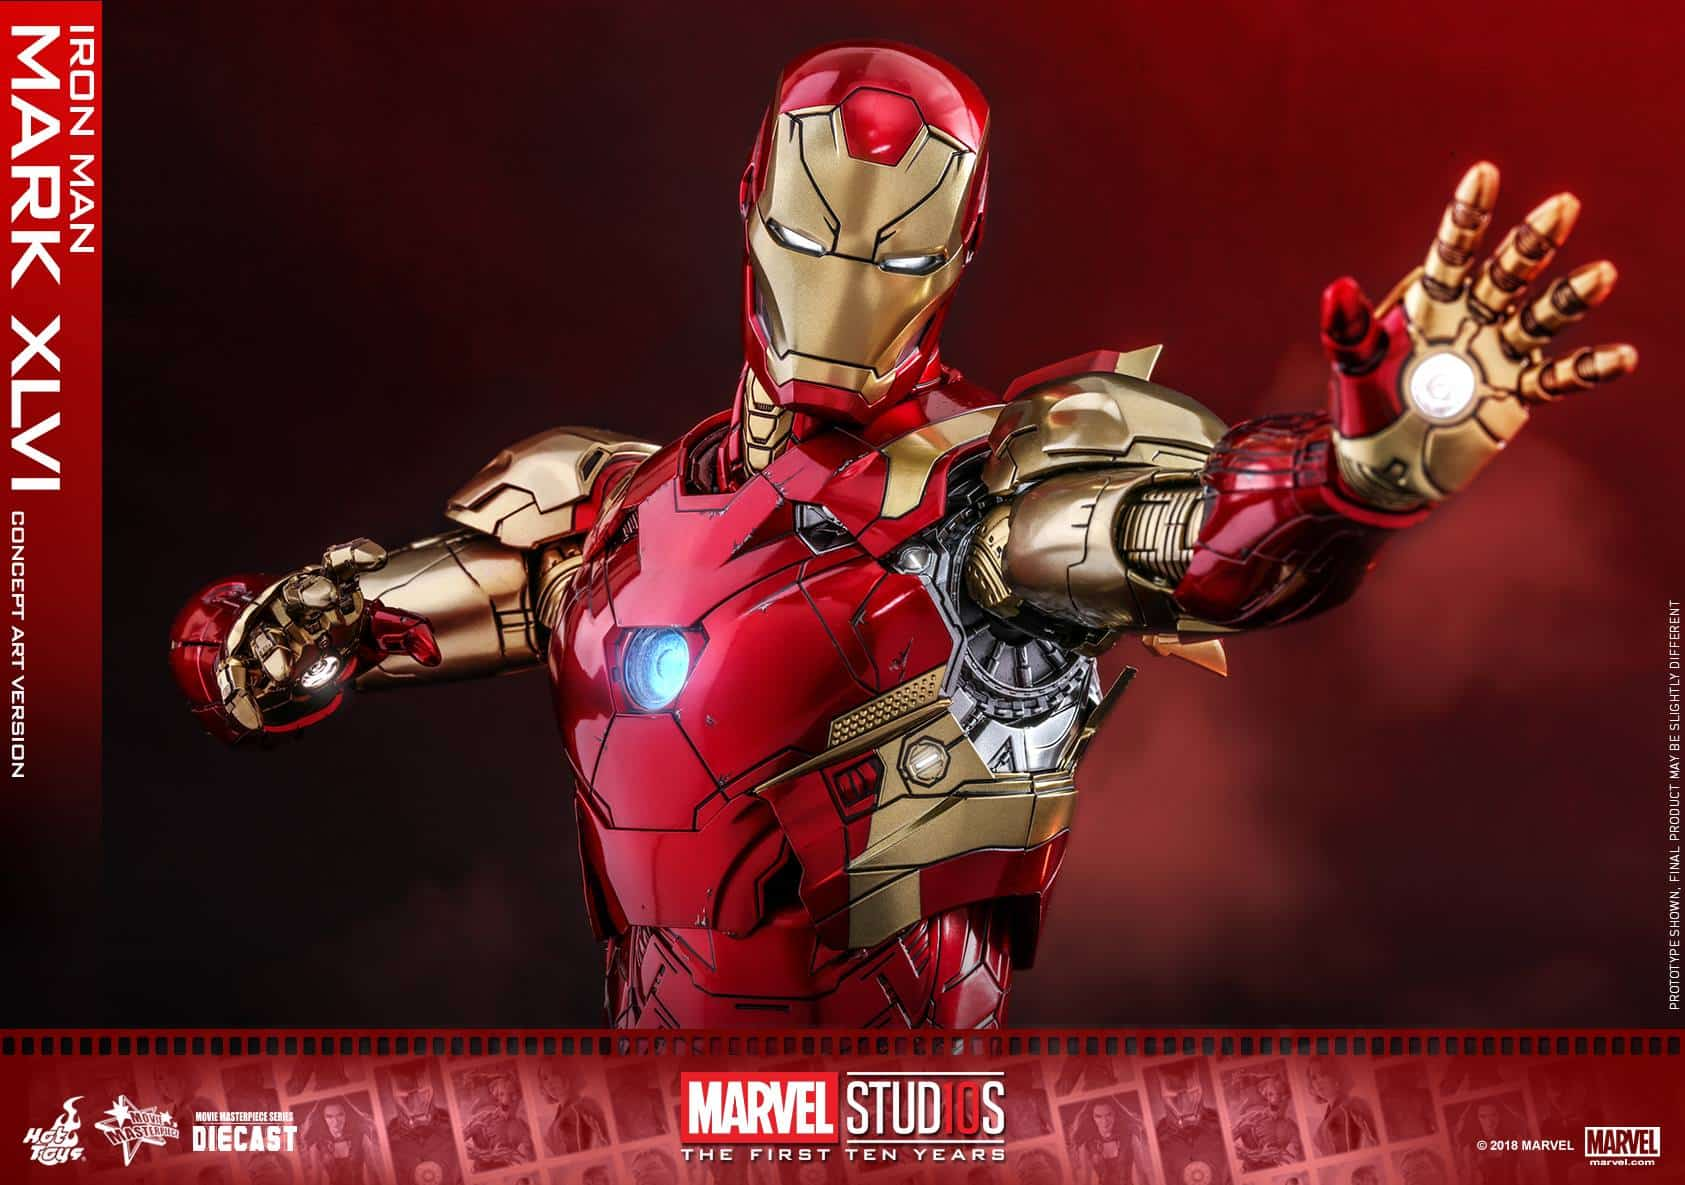 Hot Toys Marvel Studios 10th Anniversary Concept Iron Man Coming Soon - Bleeding...